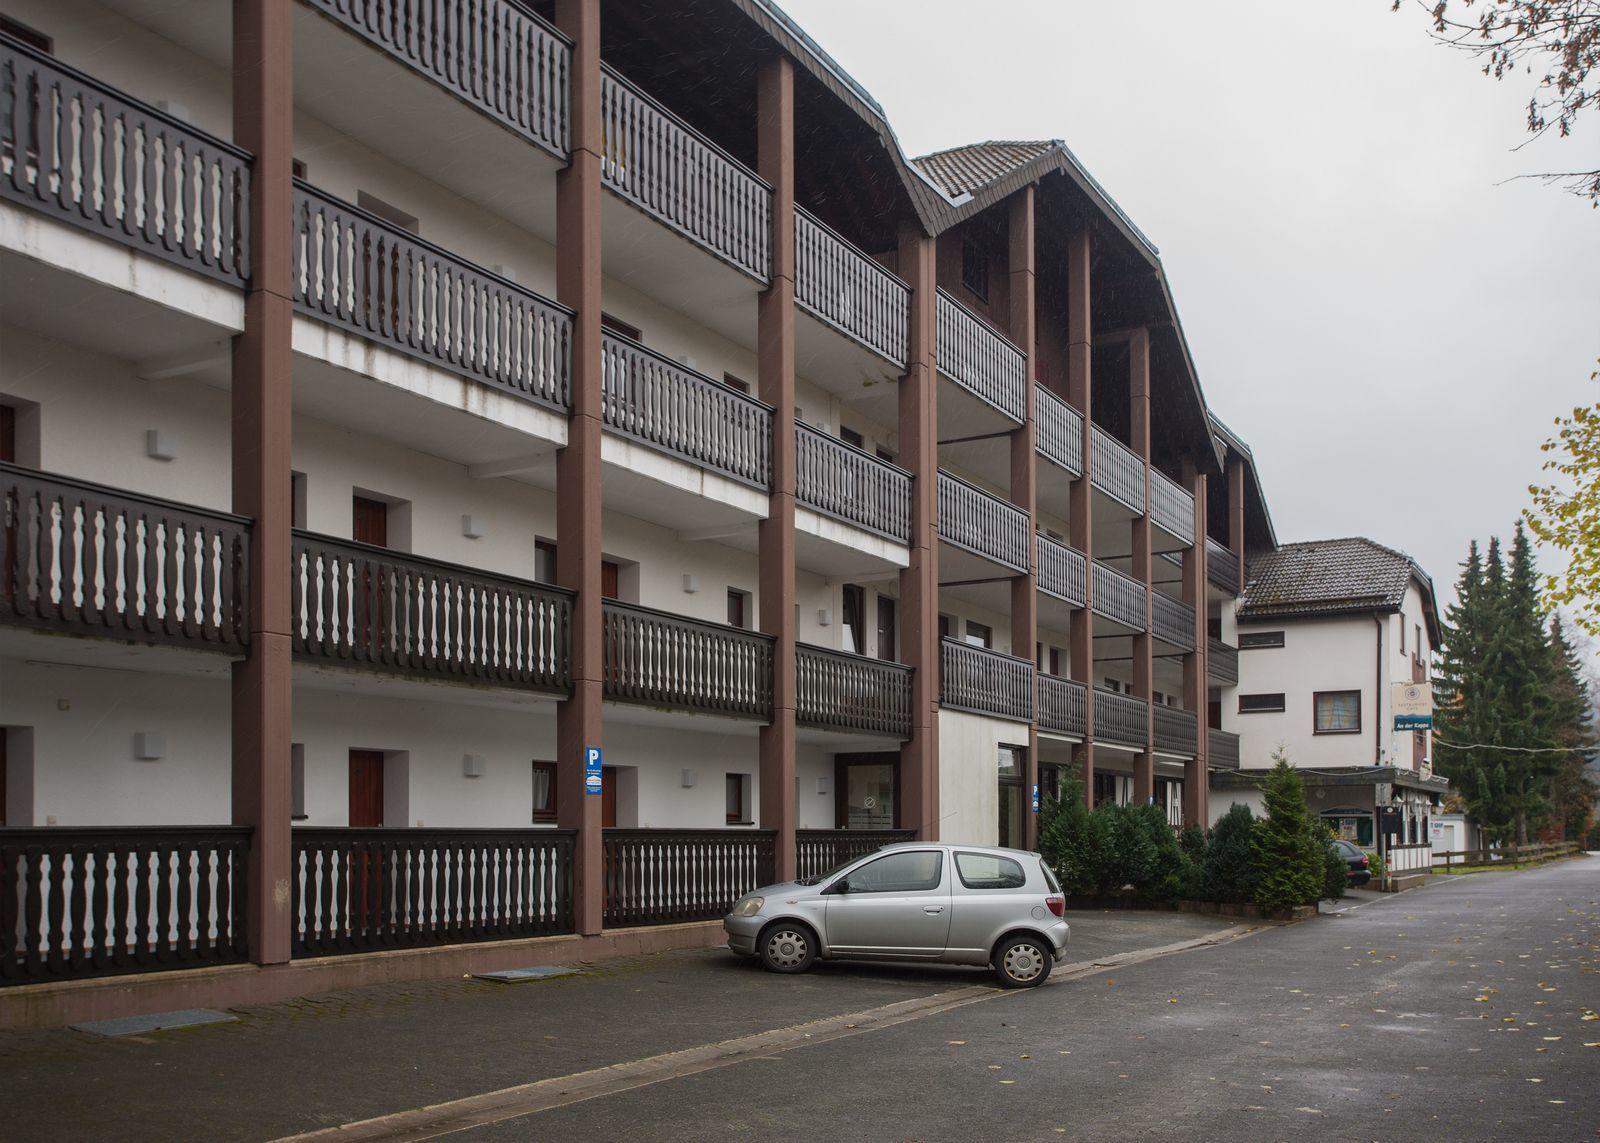 Apartment - Kapperundweg 4-B